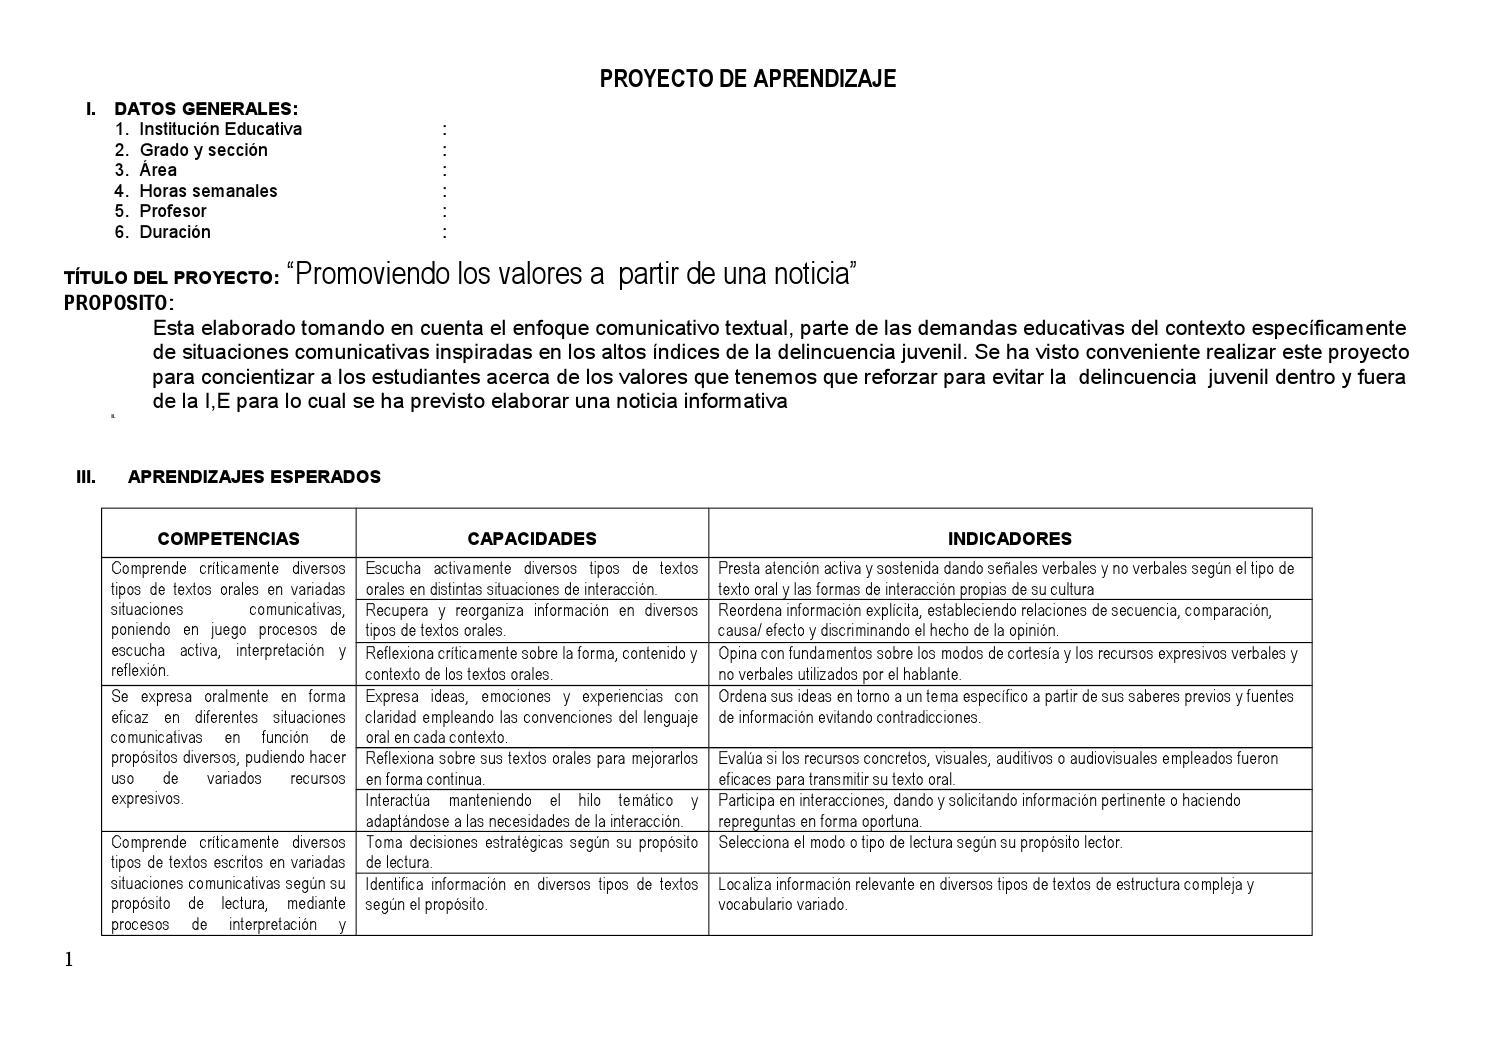 Proyecto De Aprendizaje Para Corefo By Maruja Rivera Ponce